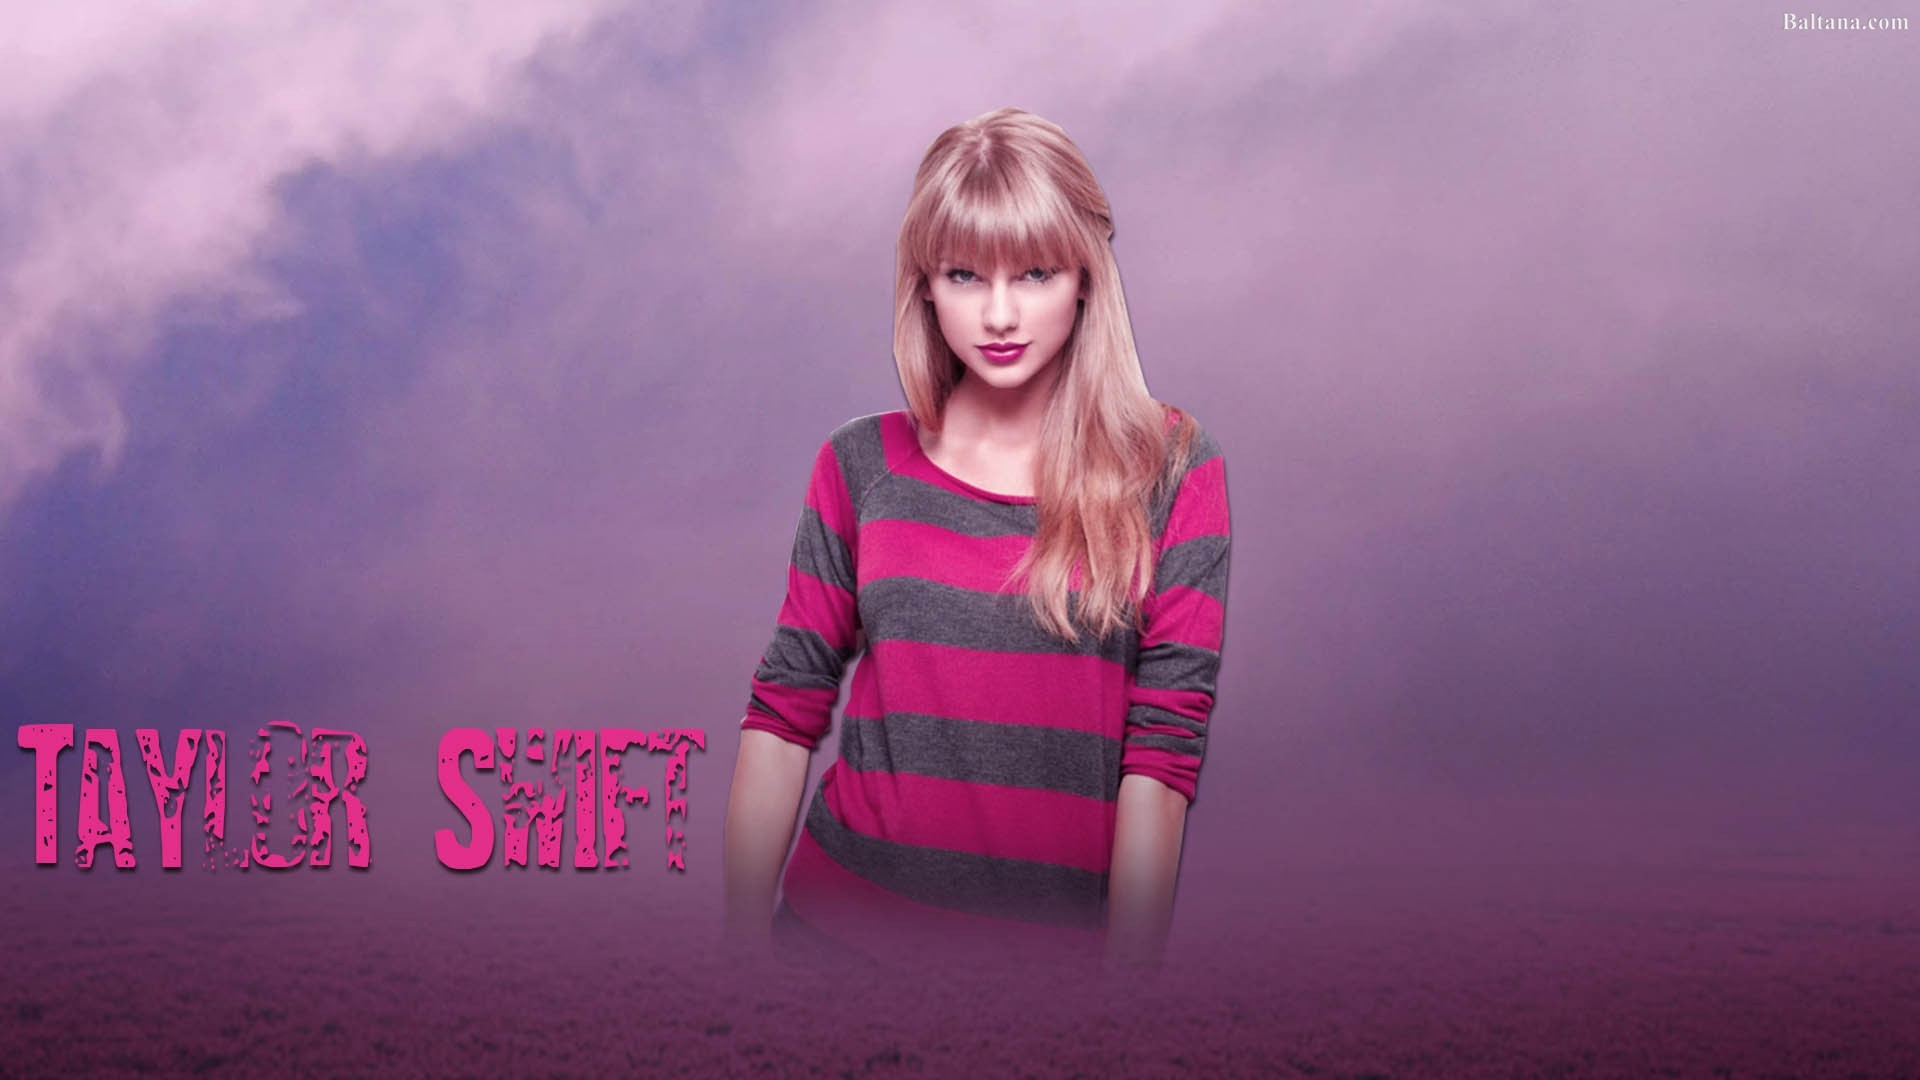 Taylor swift cool wallpaper